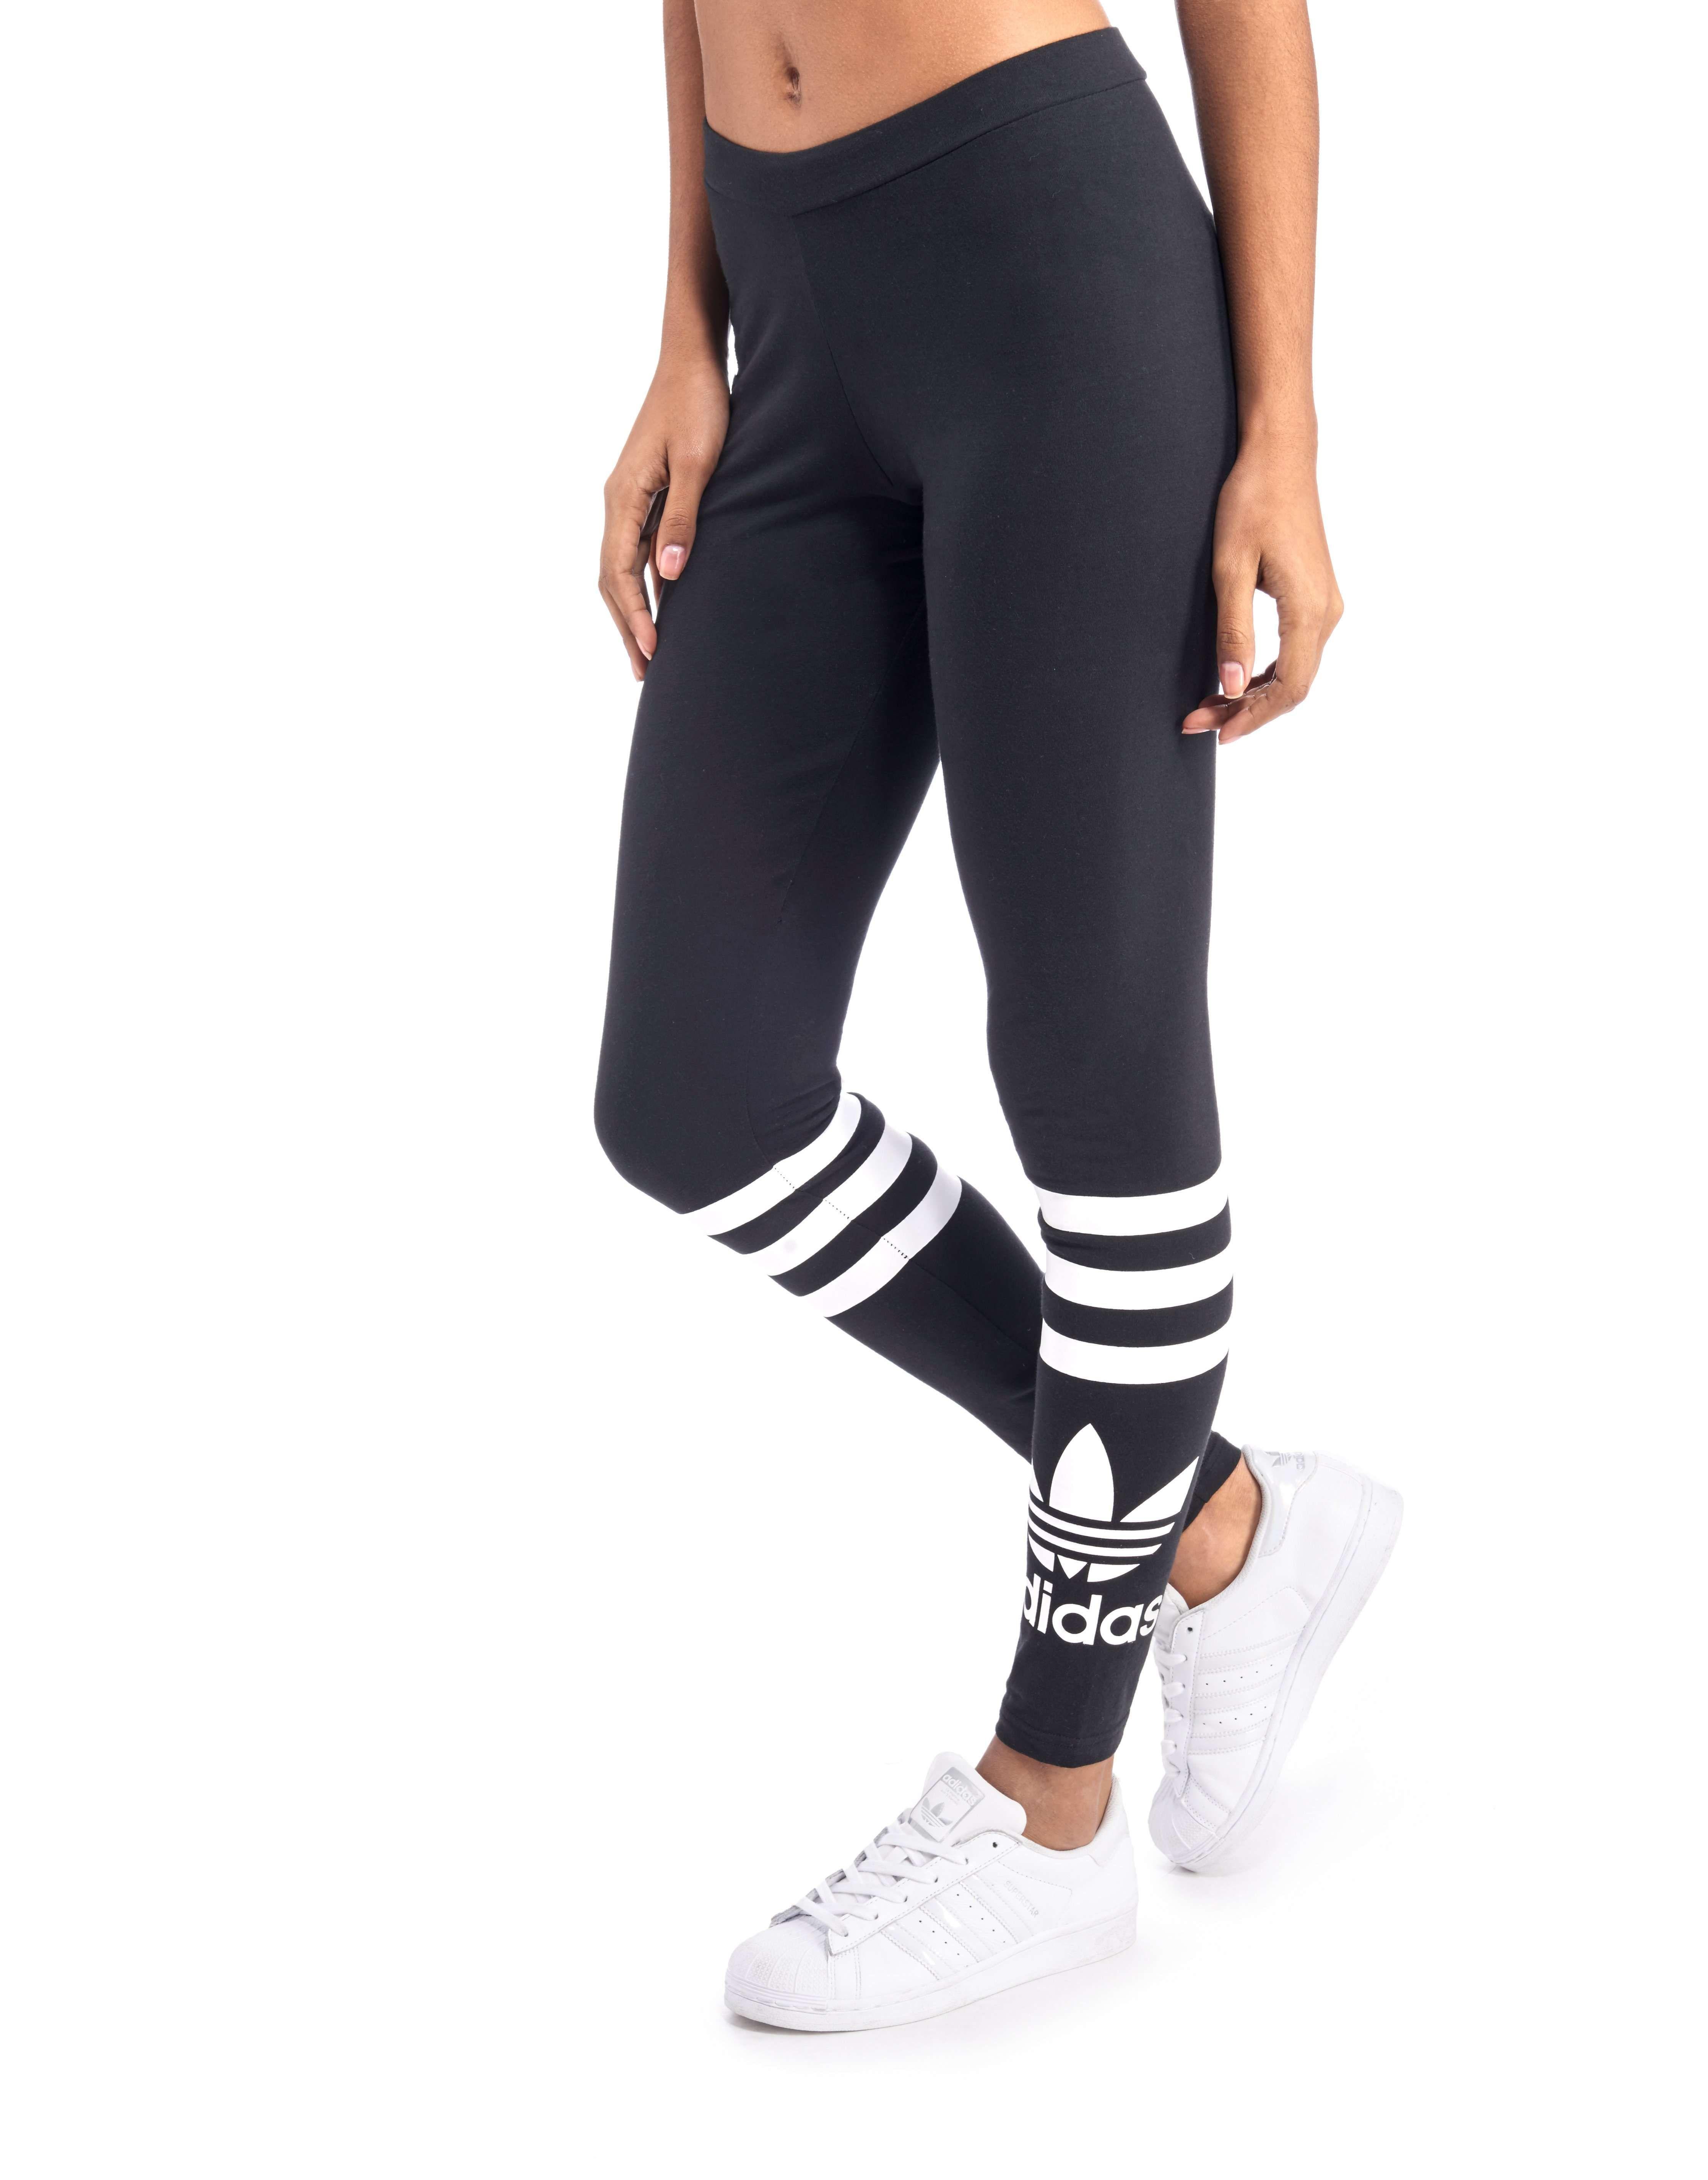 adidas originals street leggings shop online for adidas originals street leggings with jd. Black Bedroom Furniture Sets. Home Design Ideas